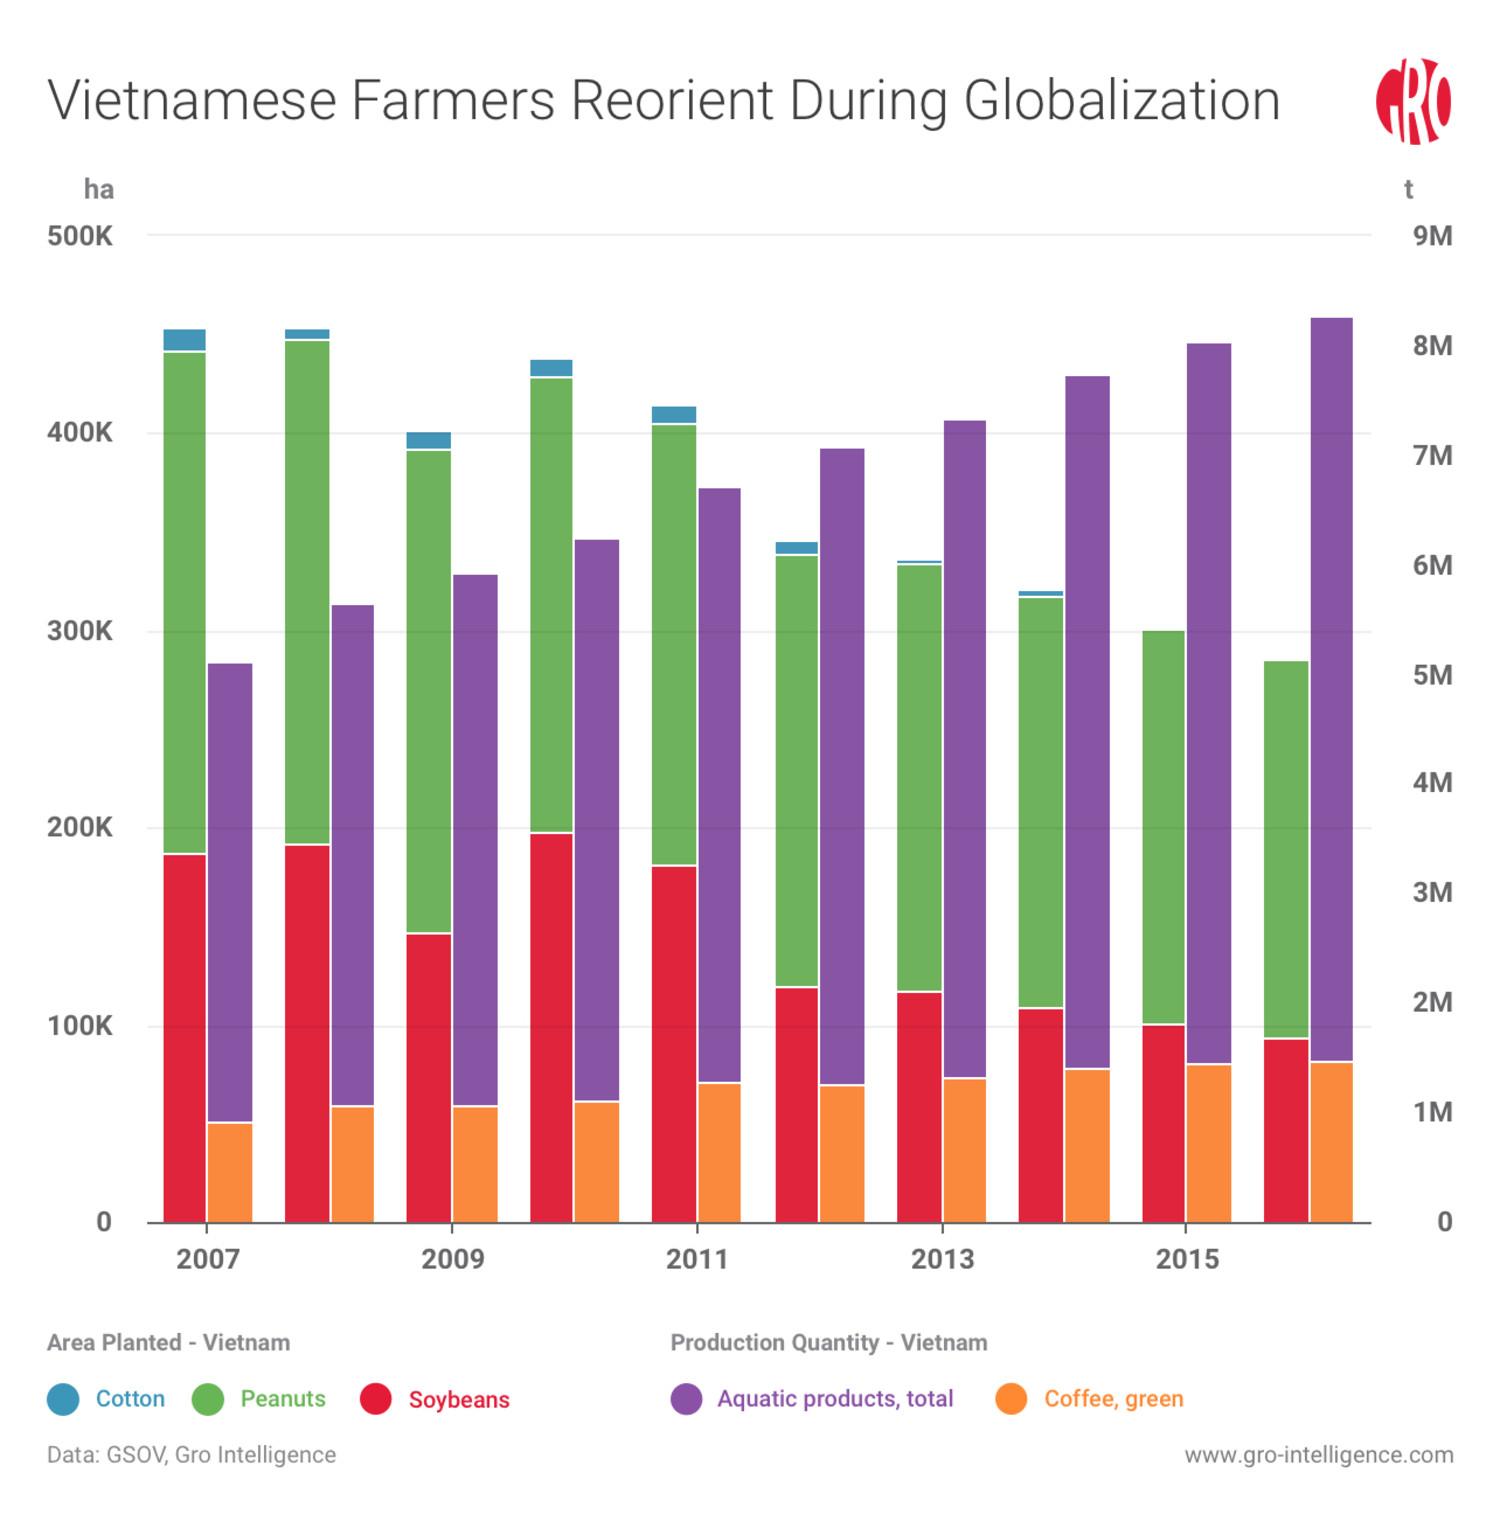 Vietnam farmers reorient crops